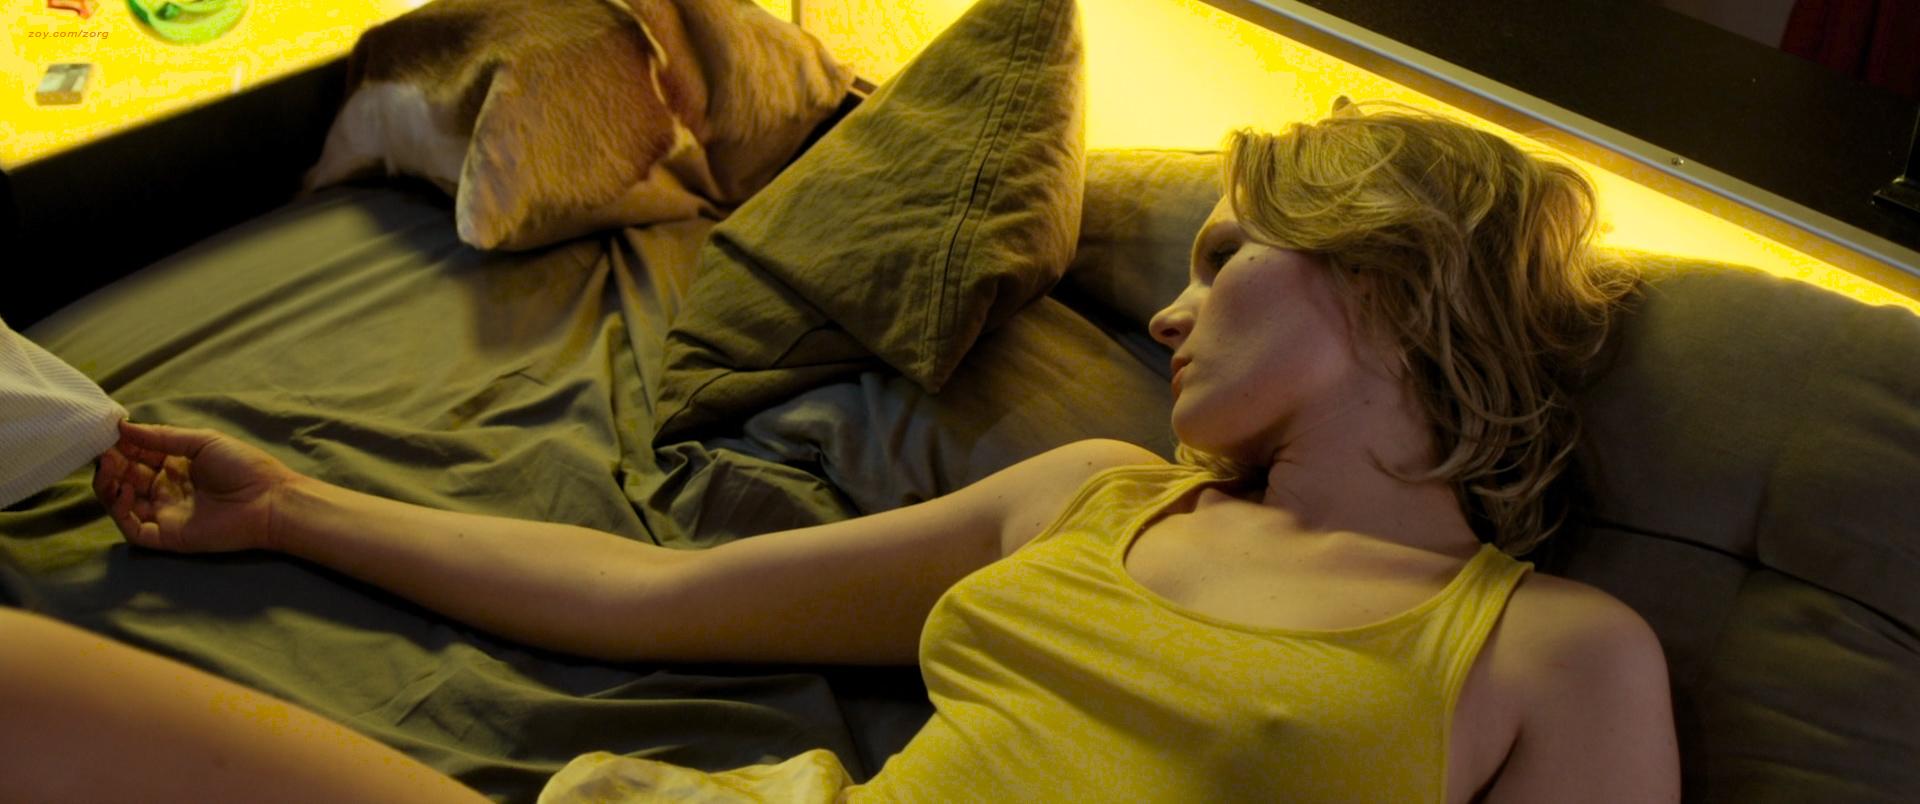 Rosalie Thomass Hot And Sexy Taxi De 2015 Hd 1080p Bluray